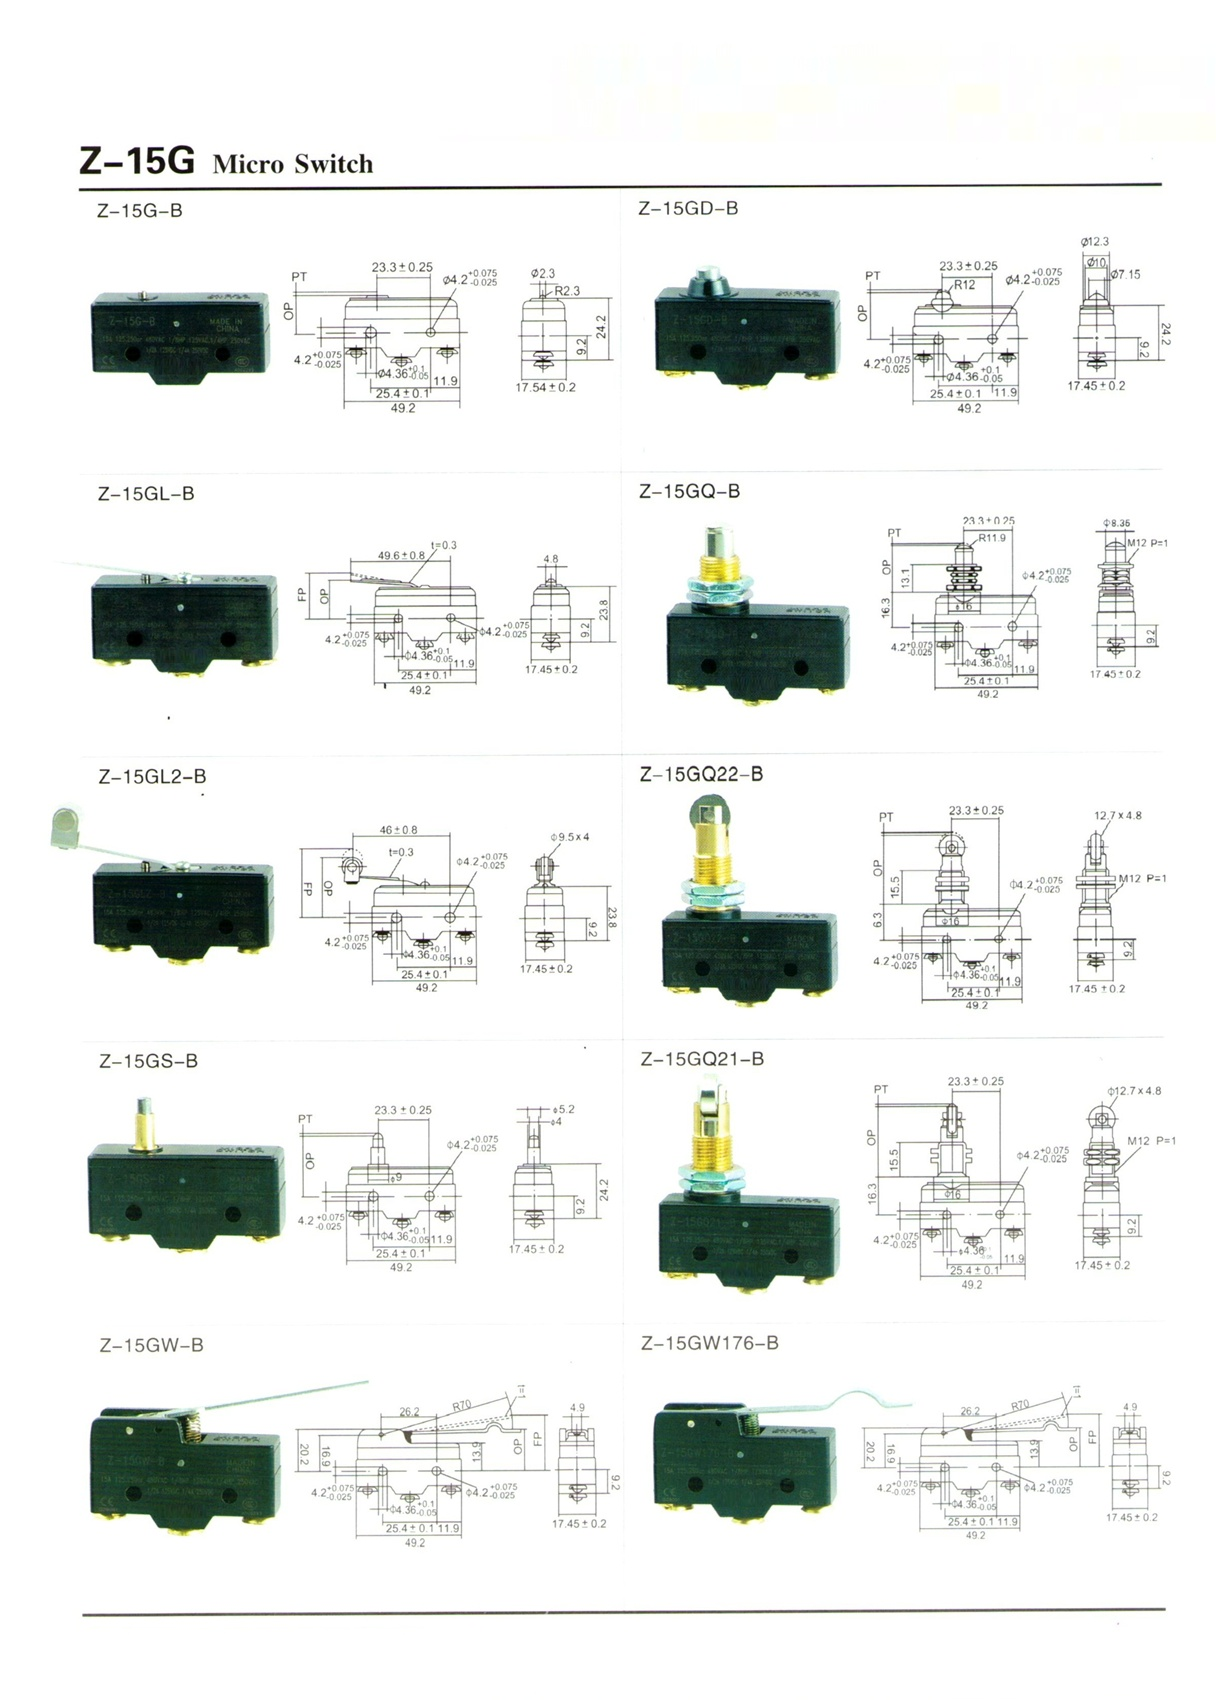 shunt trip breaker wiring diagram for hood sky multi room